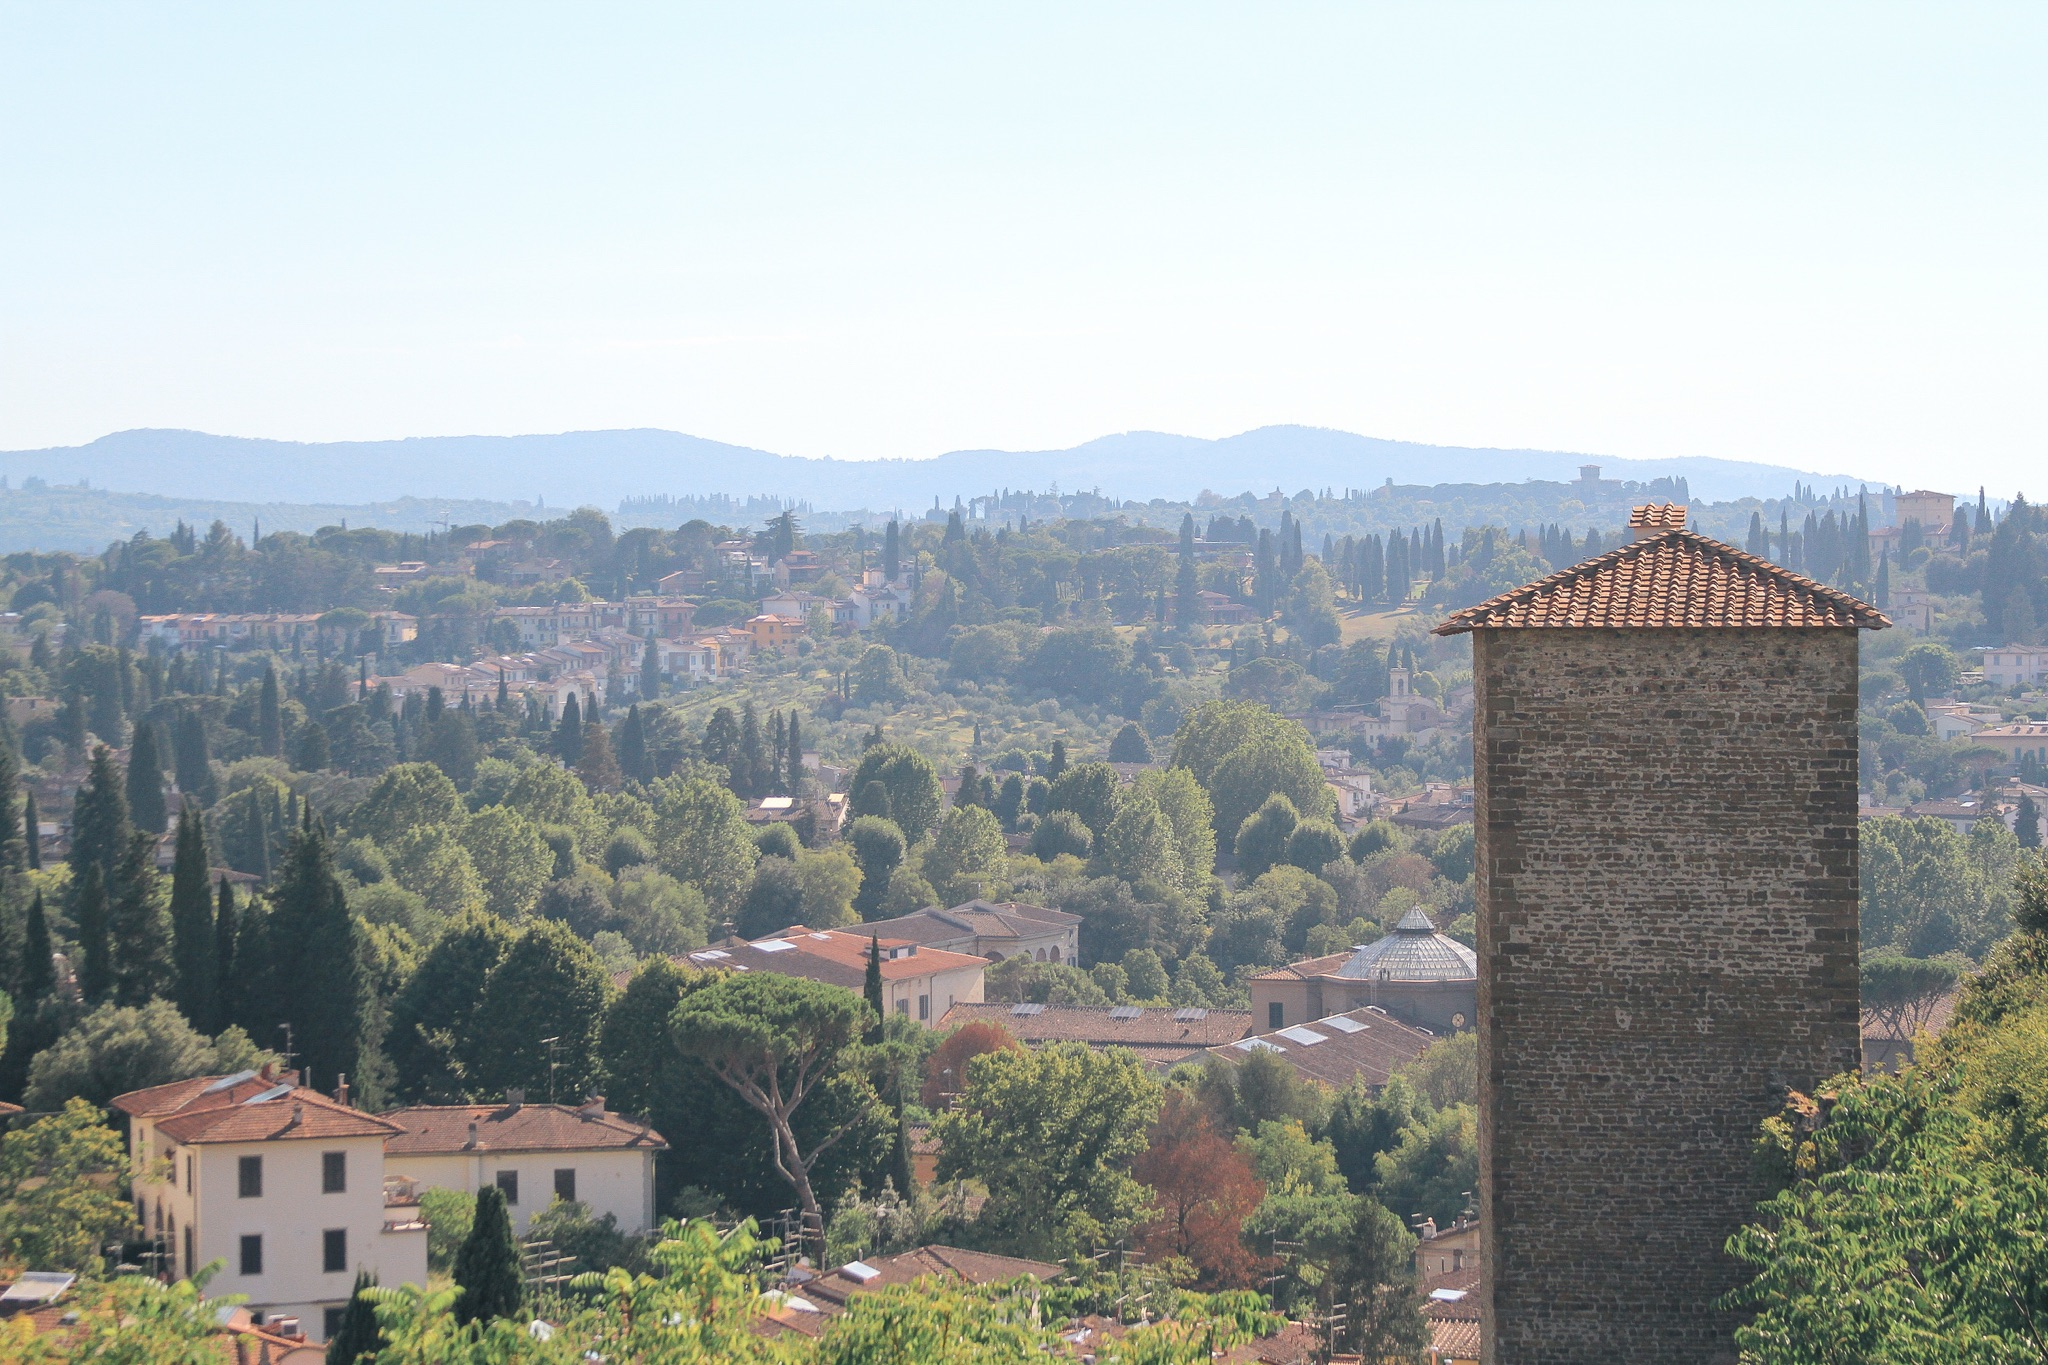 Ten-Days-Florence-Tuscany-Travel-Guide-MonicaFrancis-5